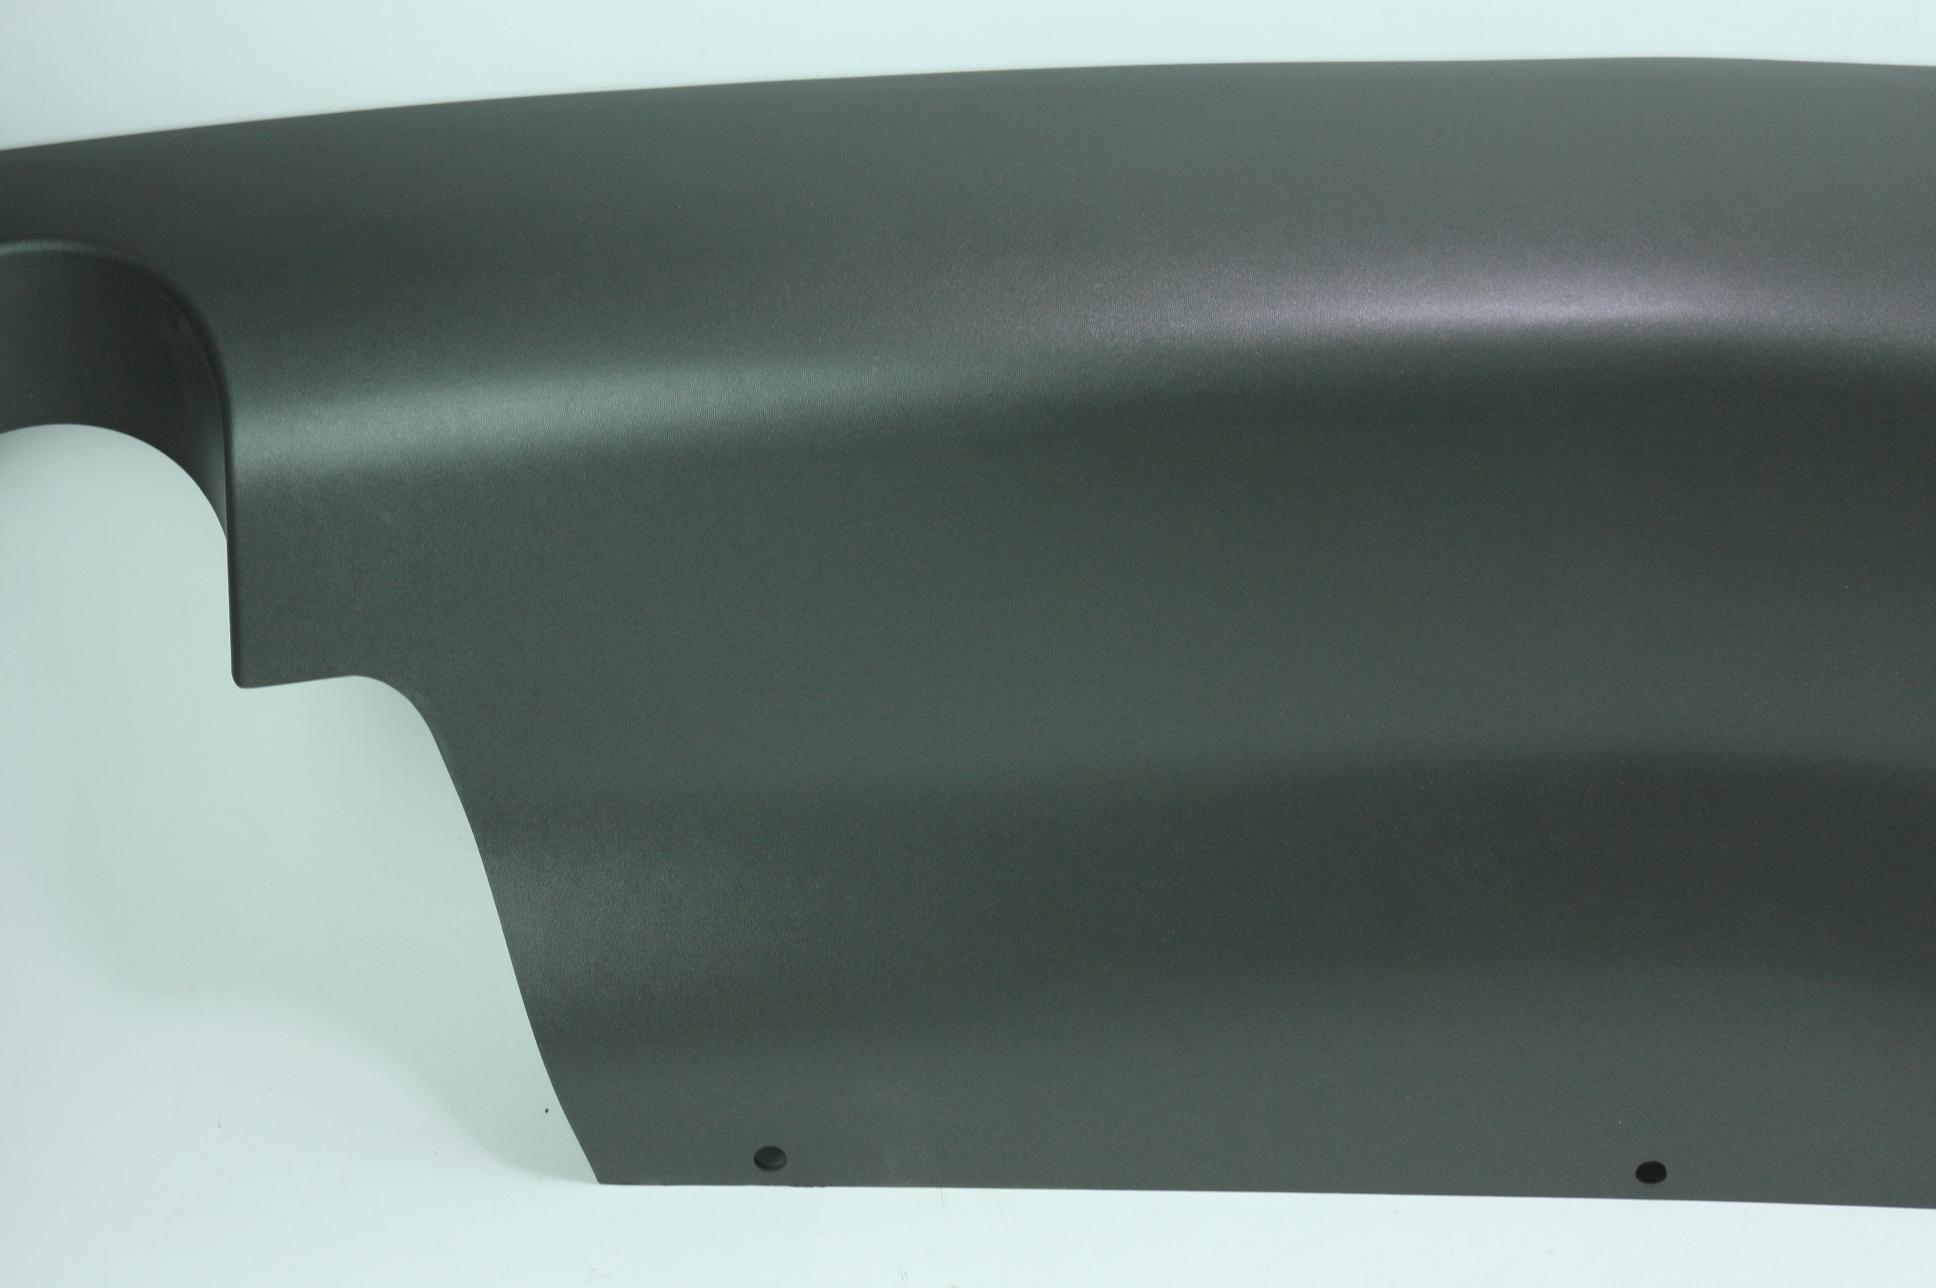 * New Genuine OEM GM 25747970 Cadillac 05-07 STS Rear Bumper Insert Panel NIP - image 4